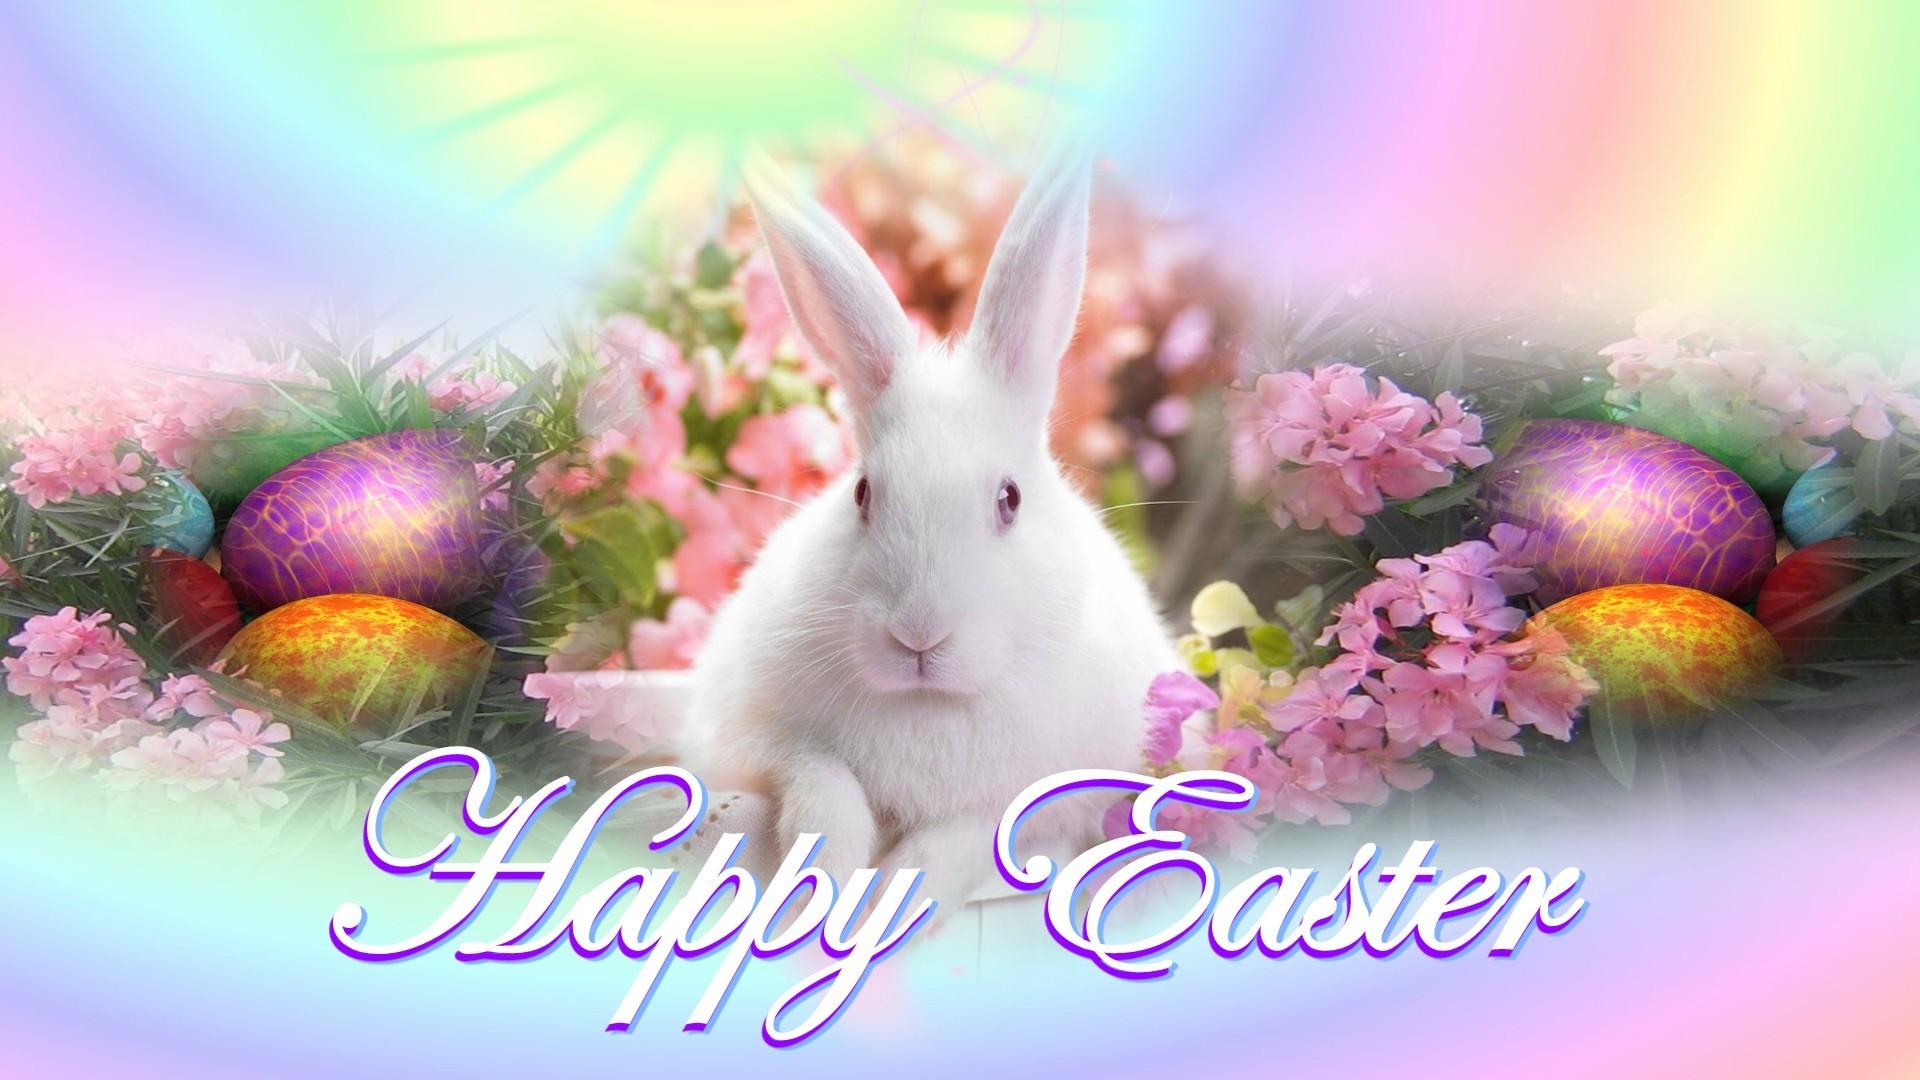 Happy Easter Bunny HD Wallpaper of Greeting   hdwallpaper2013com 1920x1080